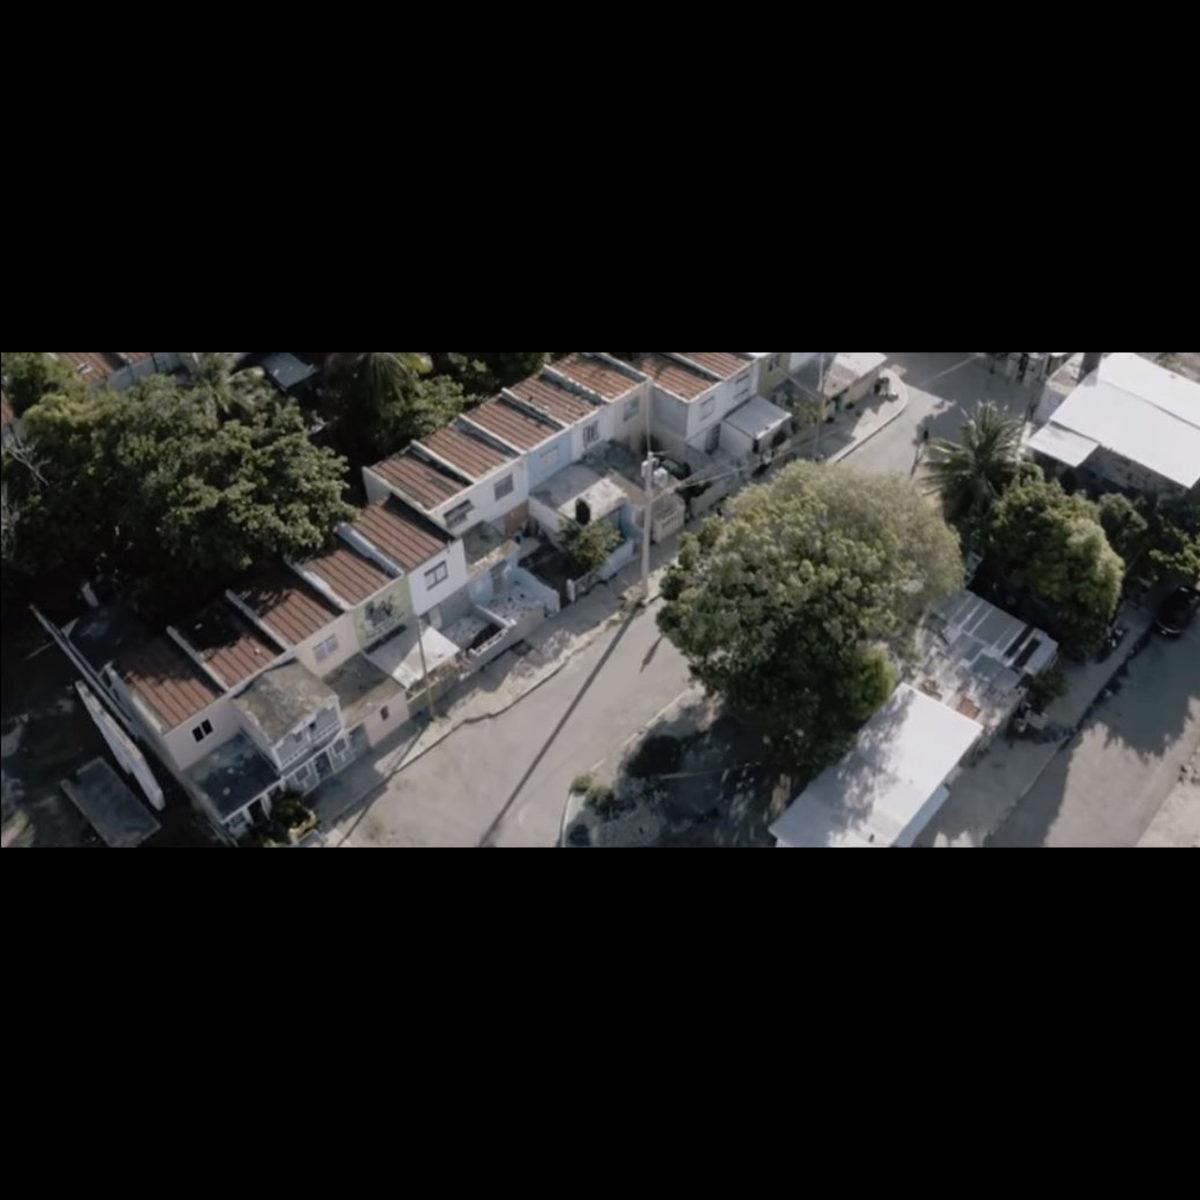 Jay-Z - Bam (ft. Damian Marley) (Thumbnail)